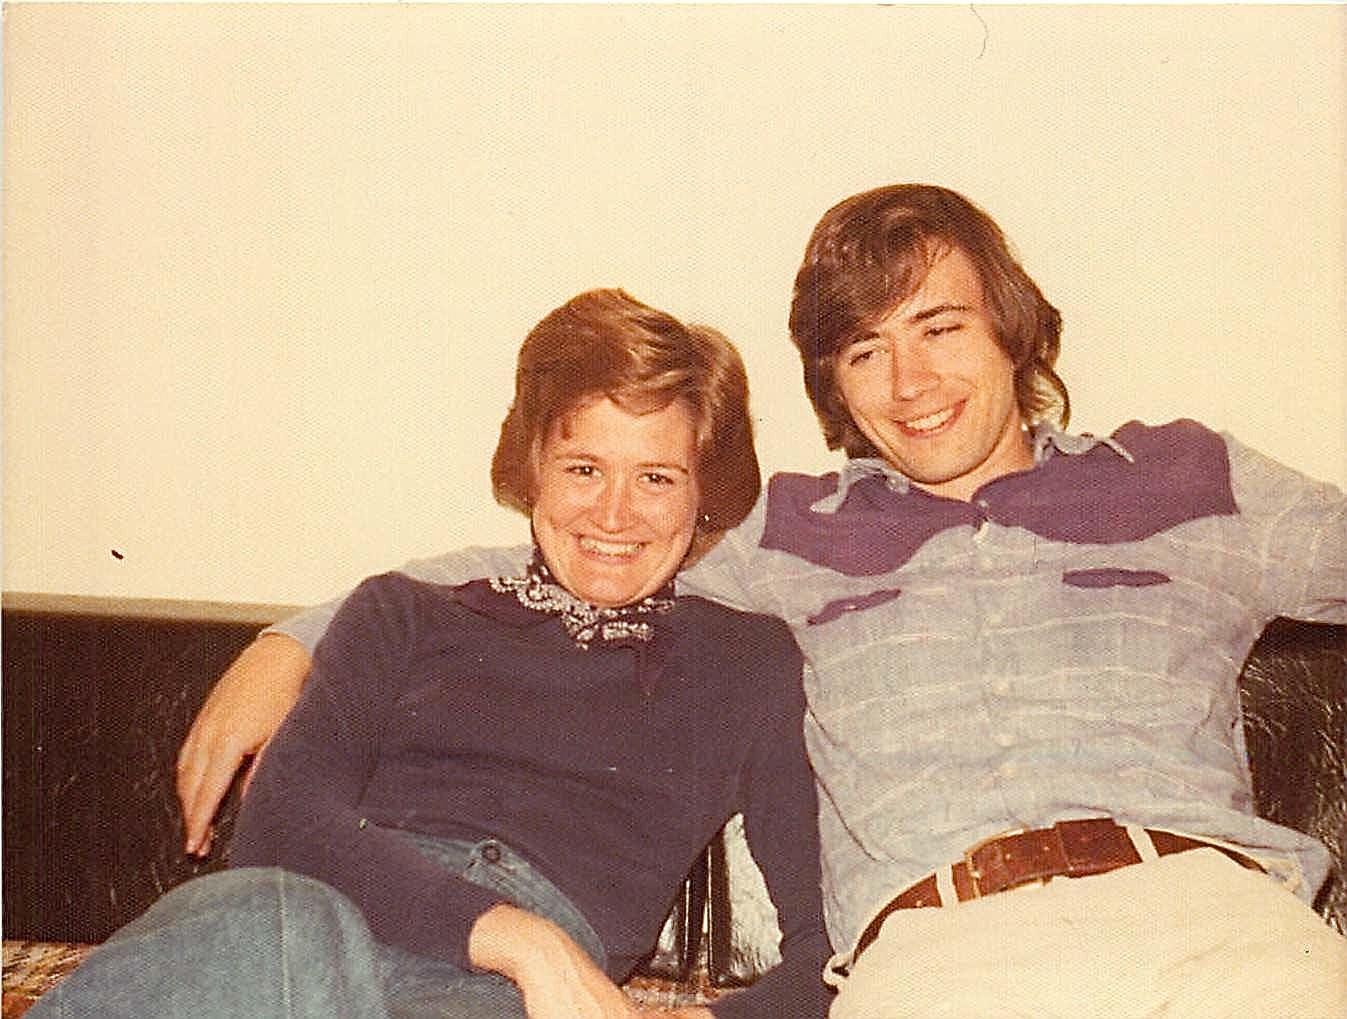 Sally & John Wagner, LA 1975